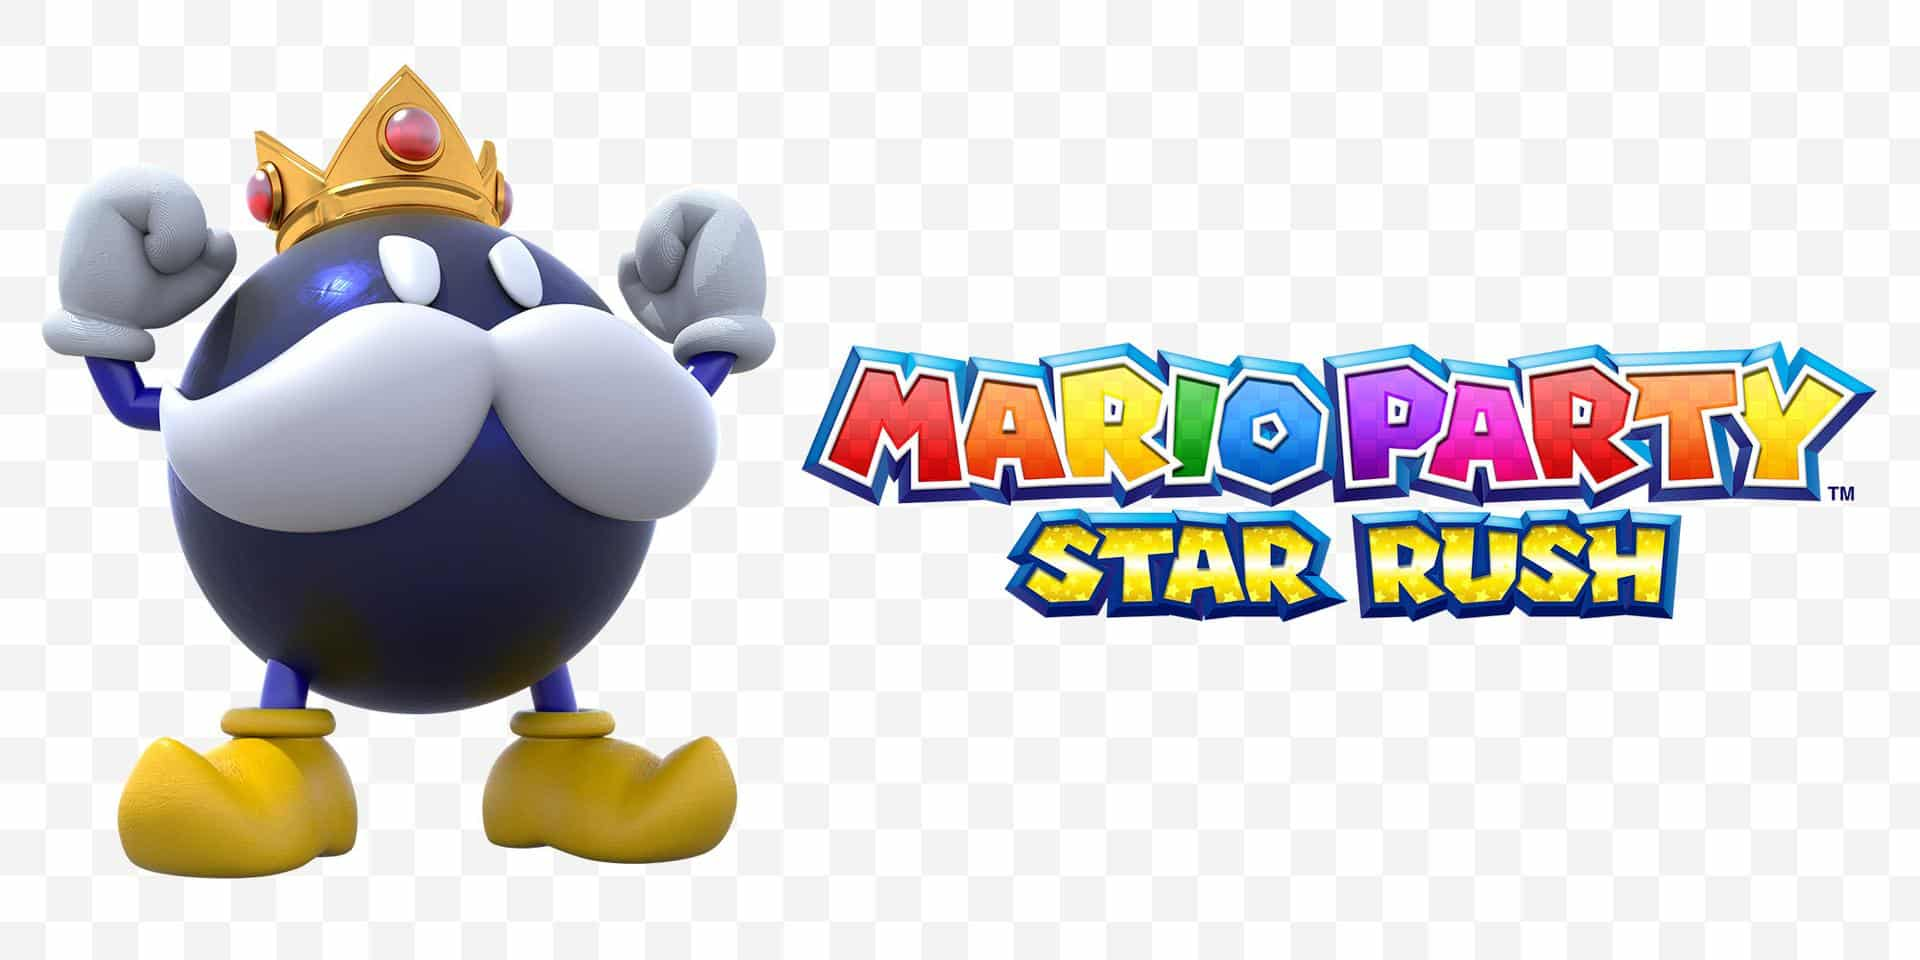 Les modes de Mario Party Star Rush dévoilés lors de la Gamescom